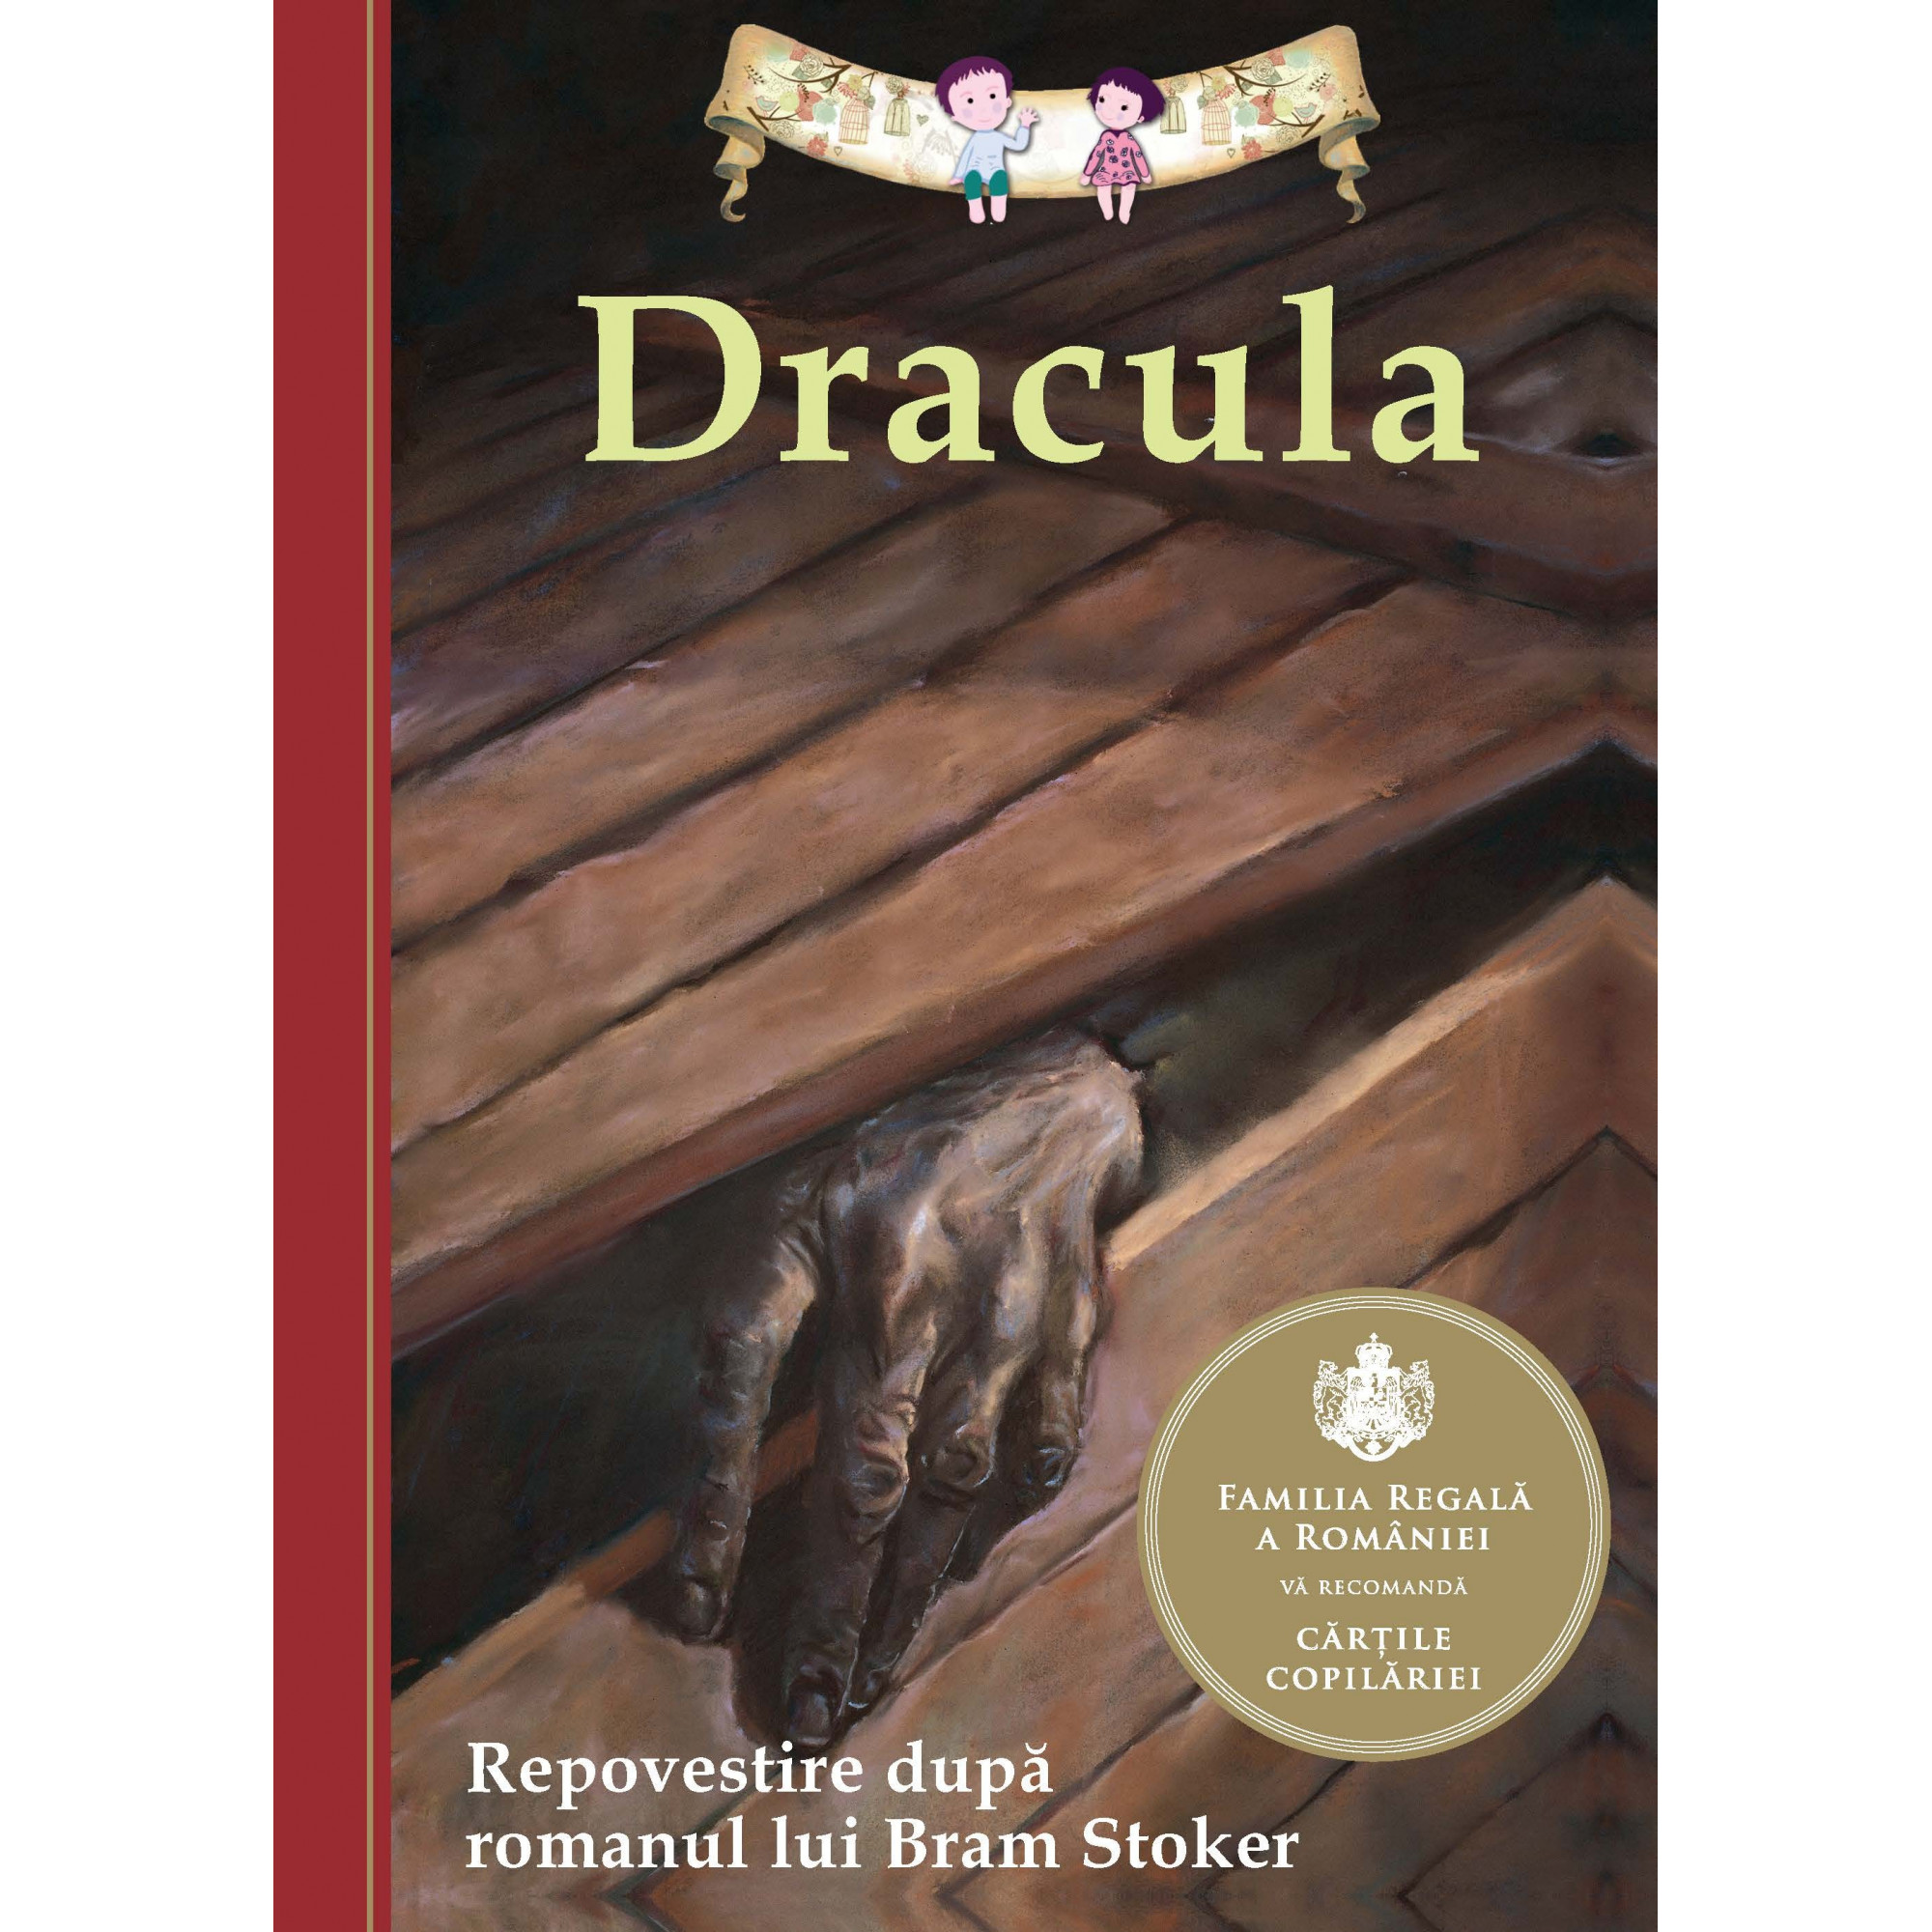 Dracula. Repovestire dupa romanul lui Bram Stoker; Tania Zamorsky